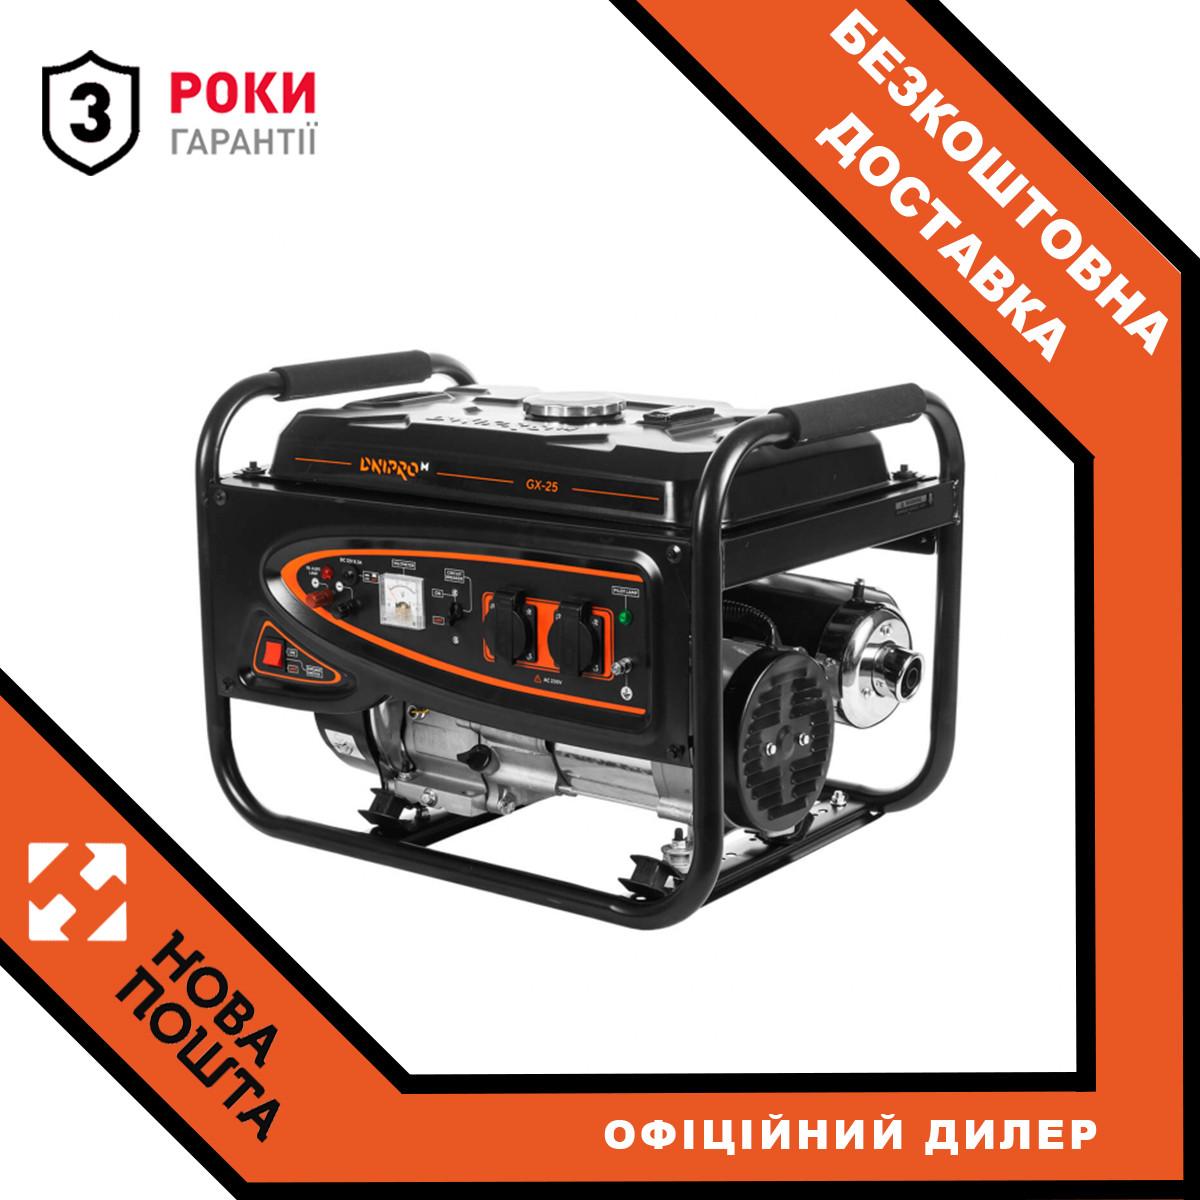 Генератор бензиновий Dnipro-M GX-25